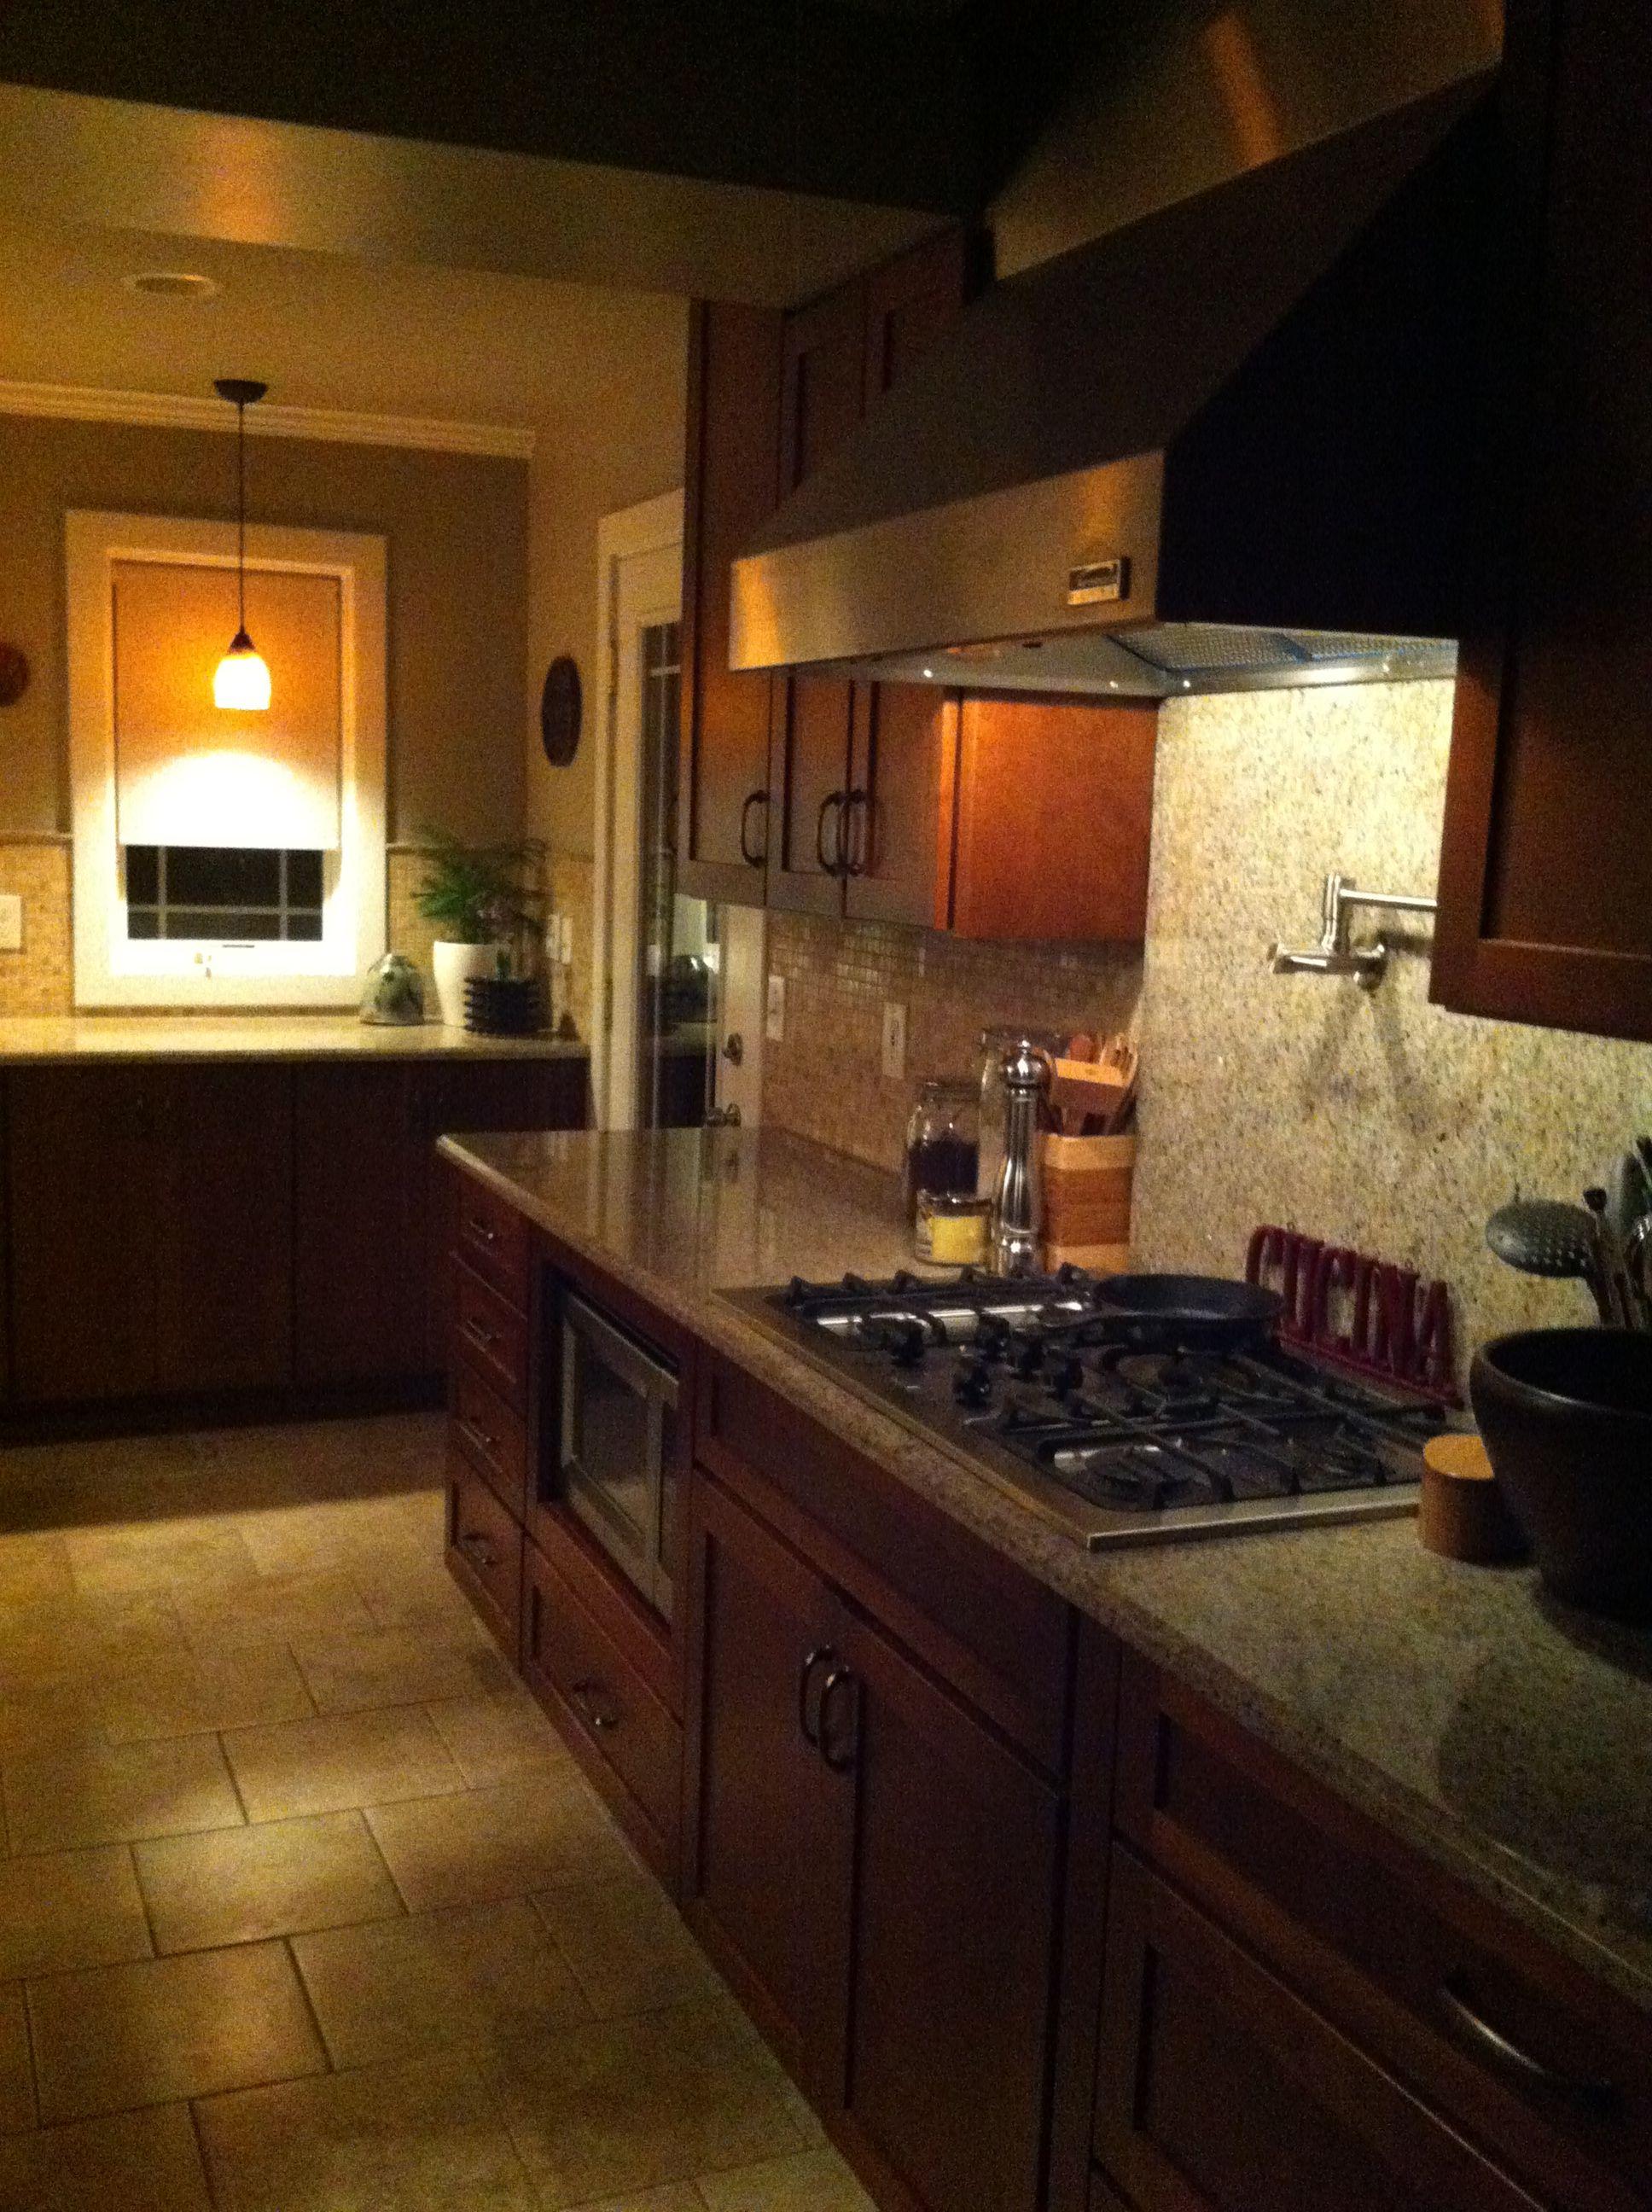 Best Kitchen Sherwin Williams Mindful Grey Walls Granite 400 x 300